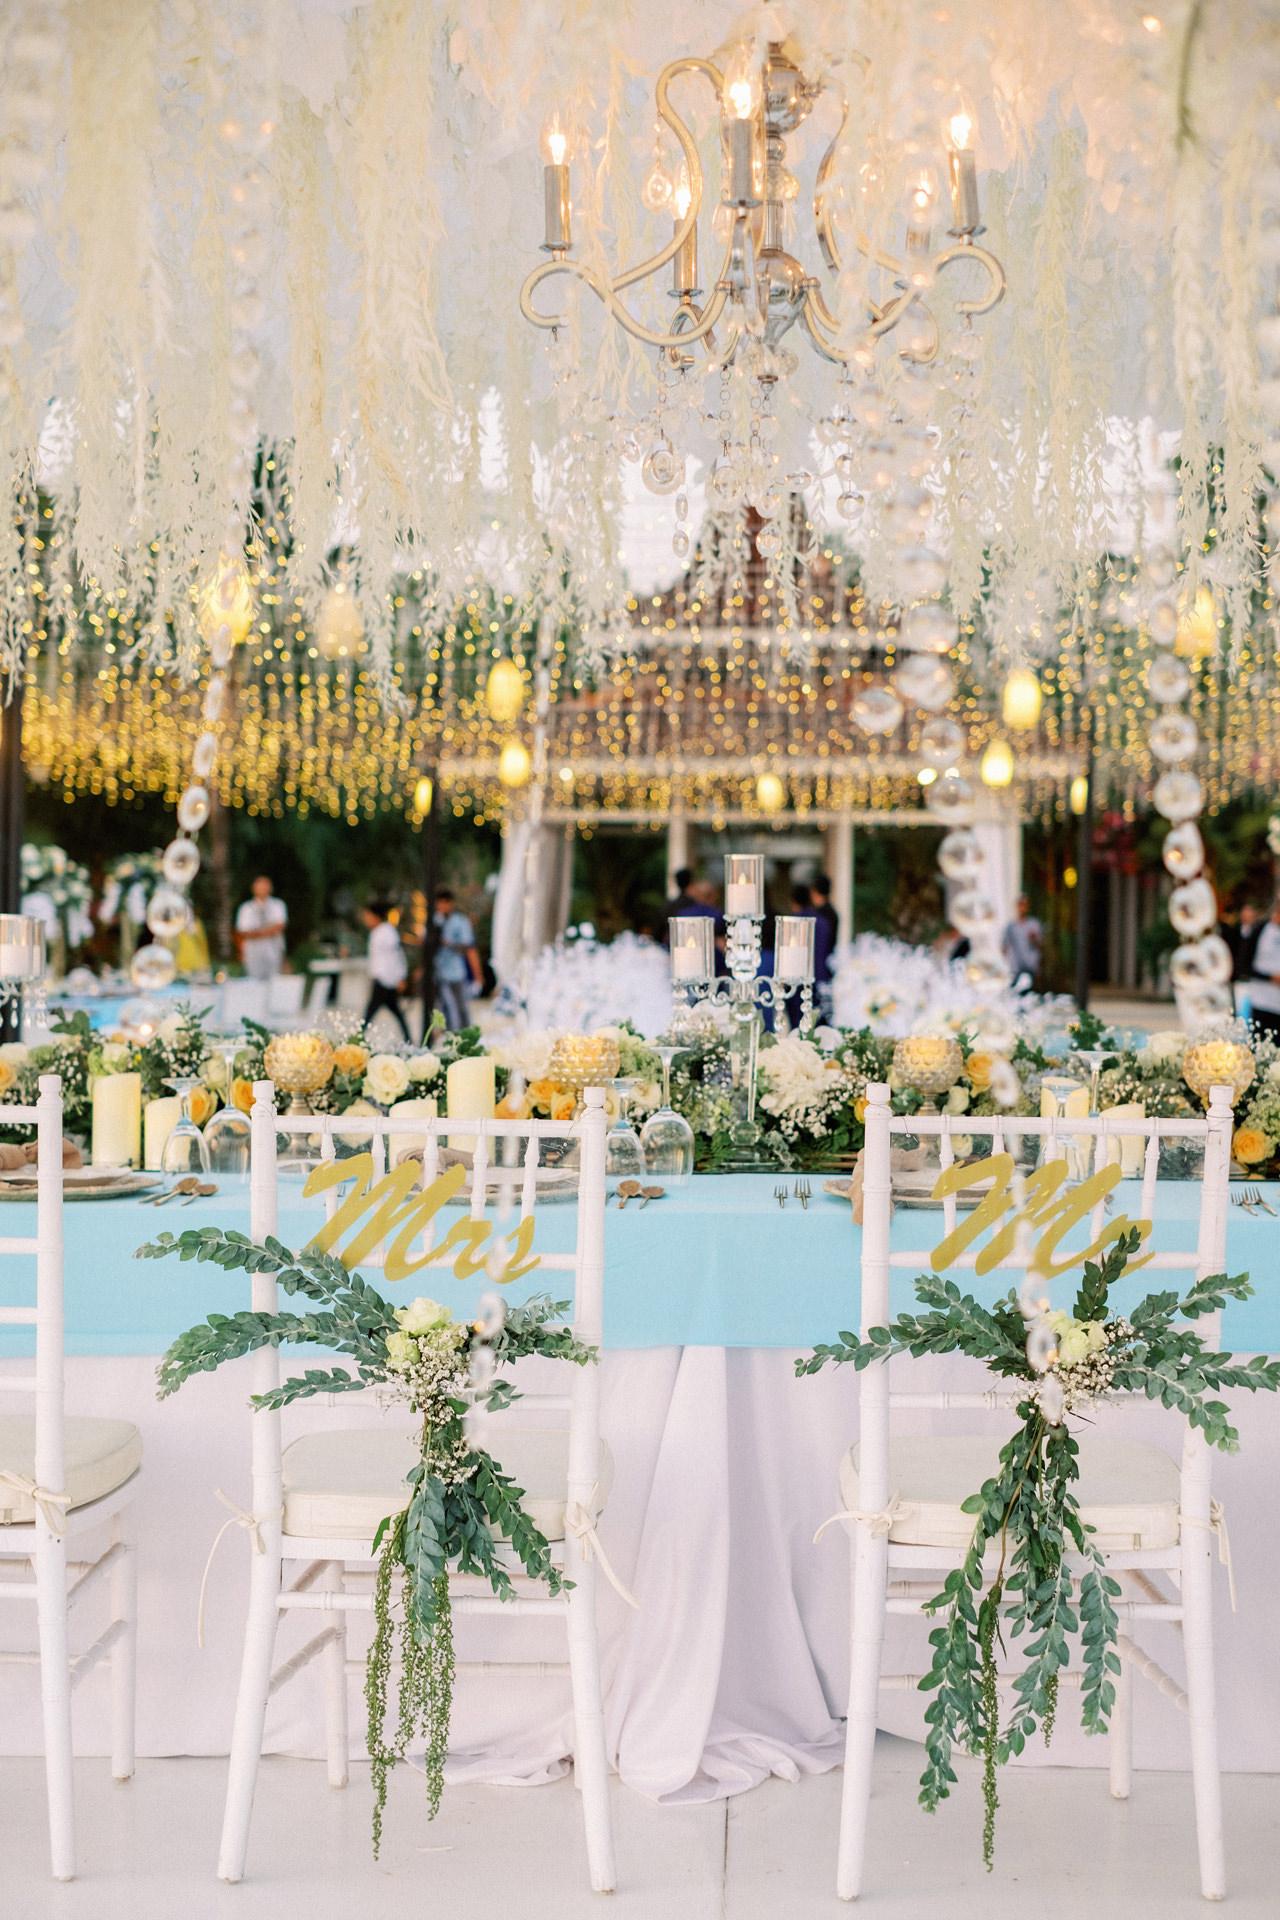 M&S: Shades of Blue Villa Plenilunio Bali Wedding 93